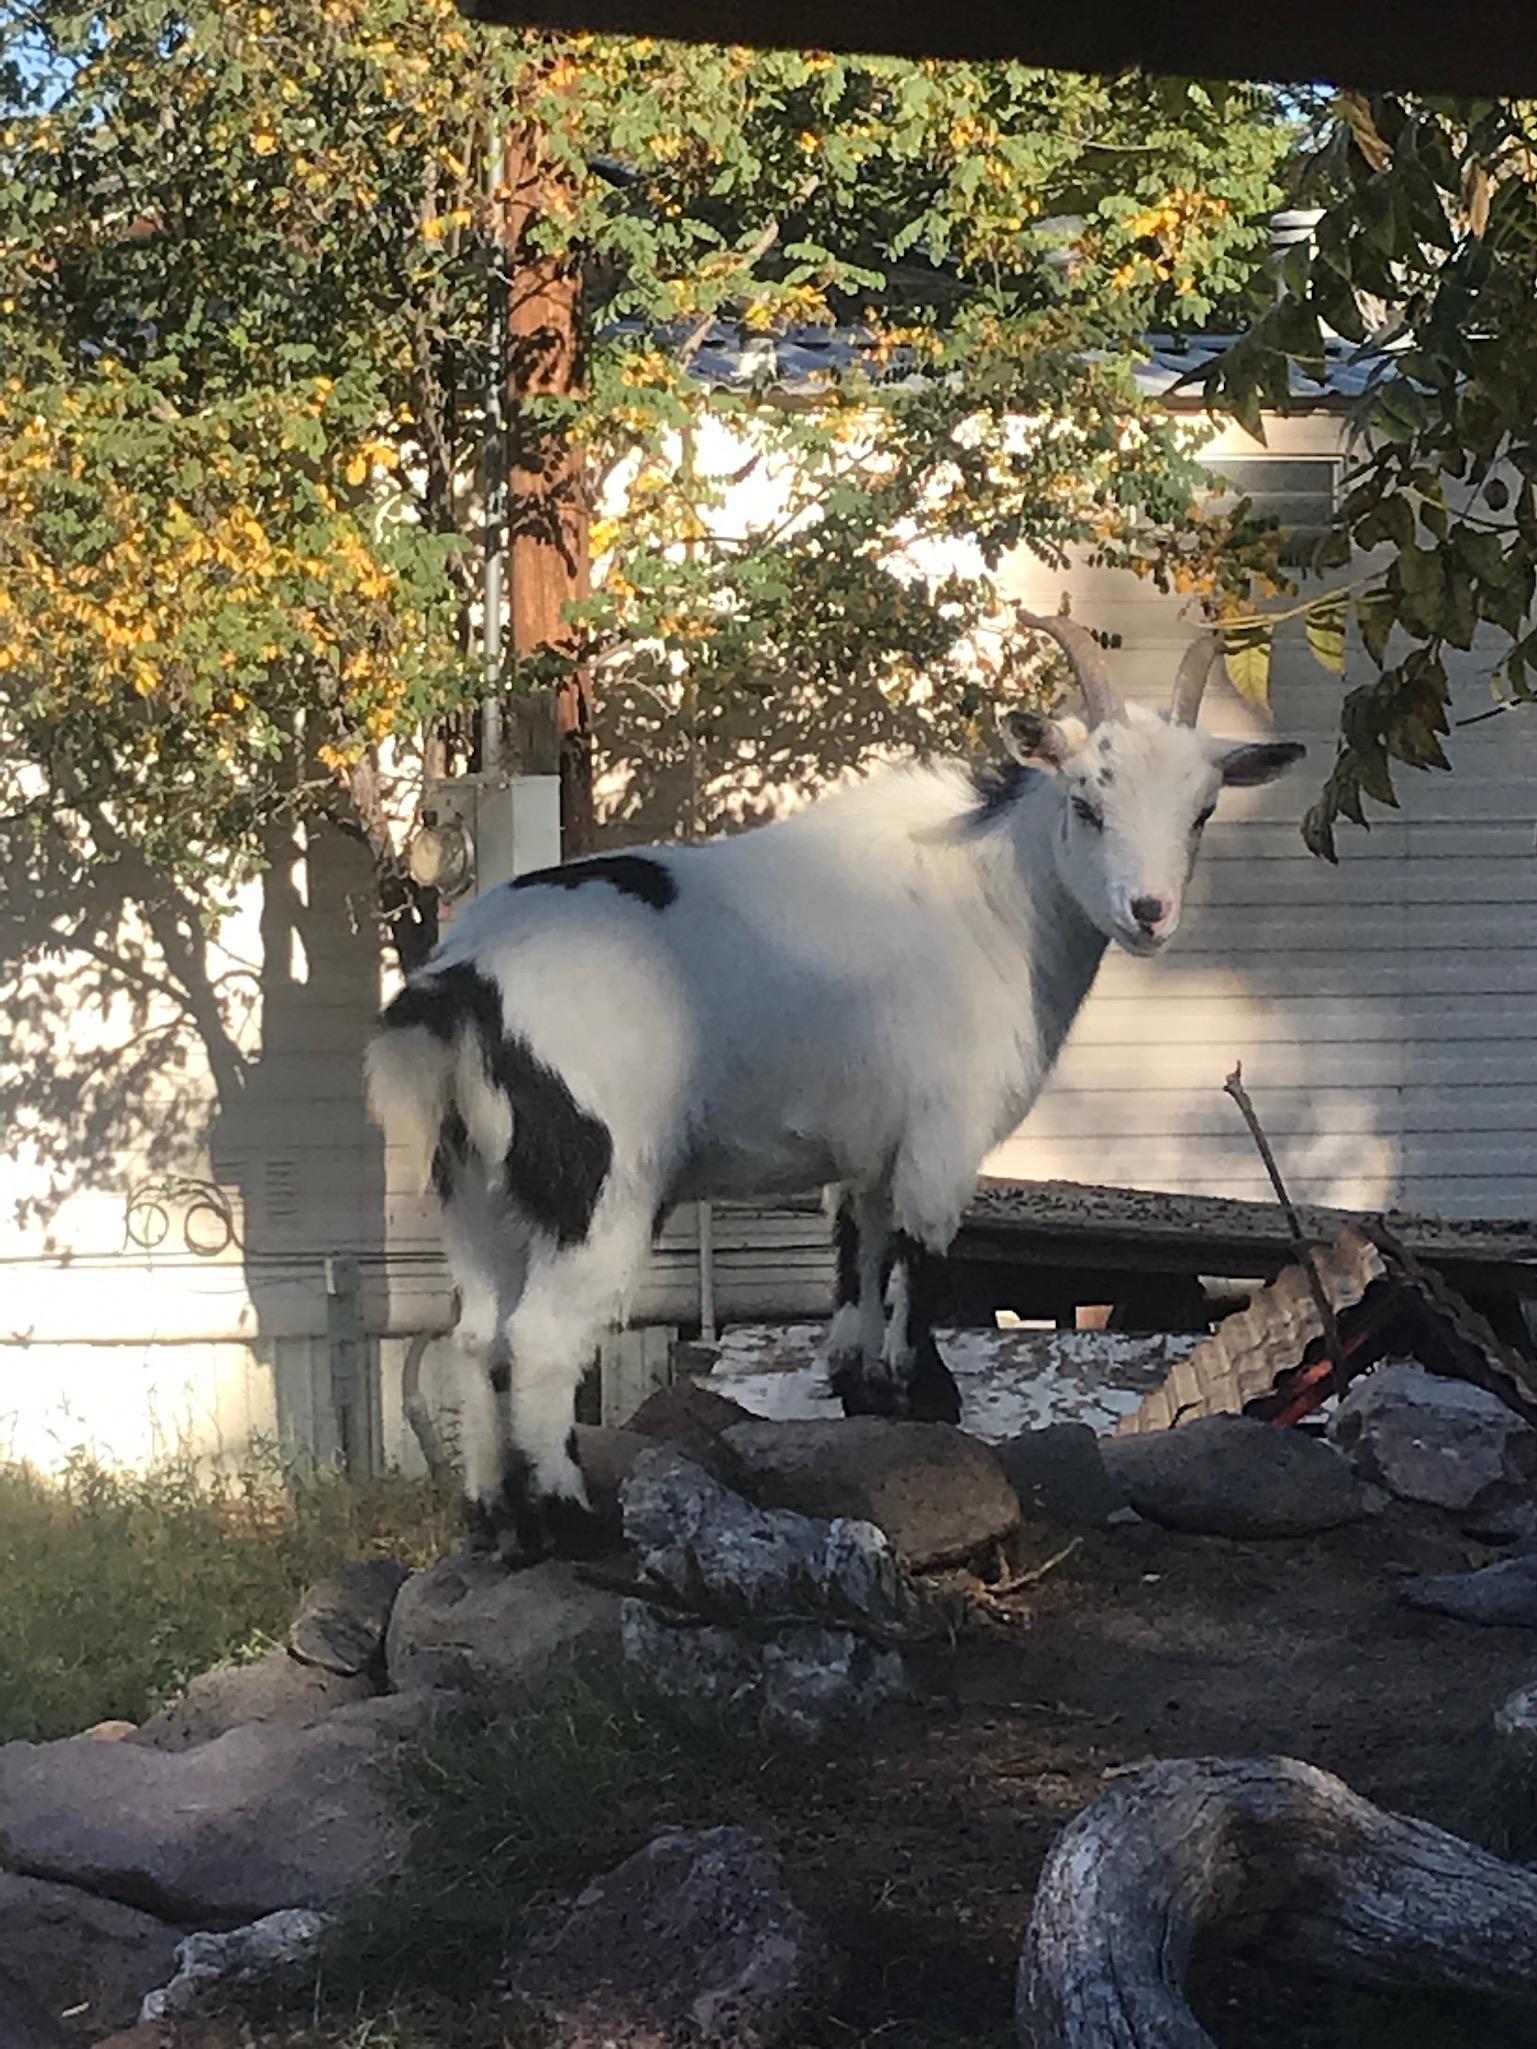 Friendly goat.